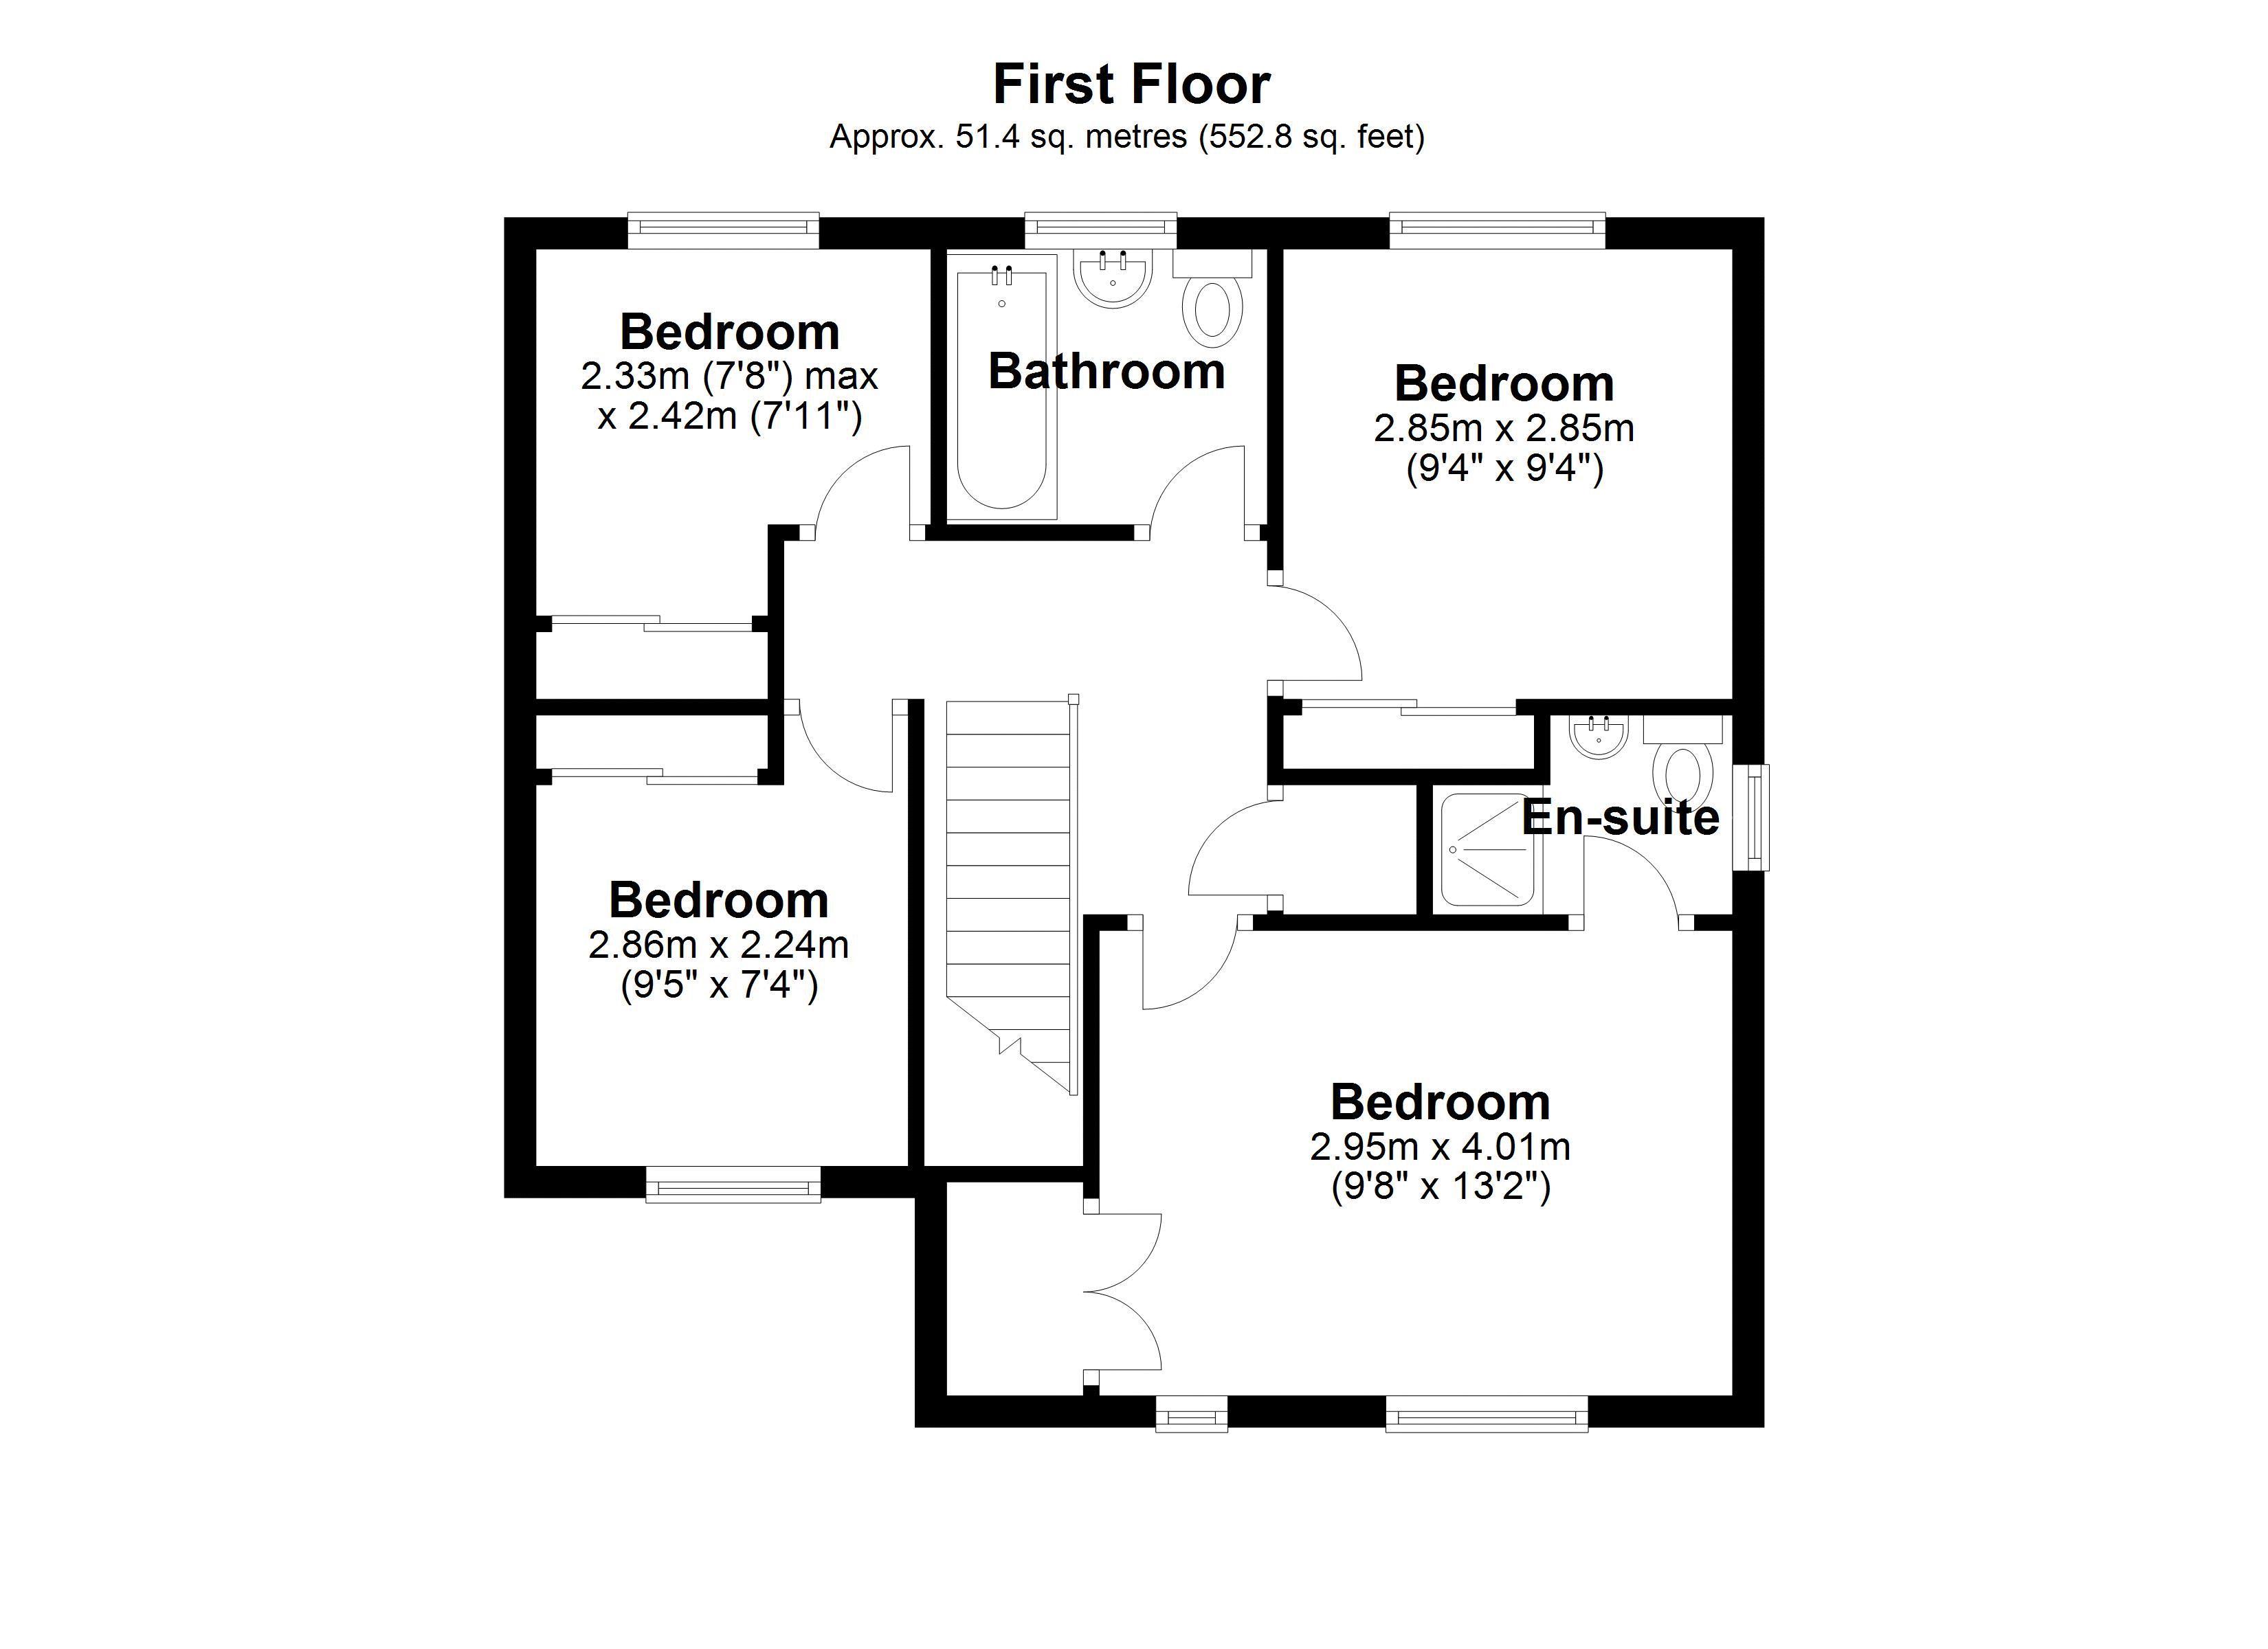 KIngfisher First floor plan